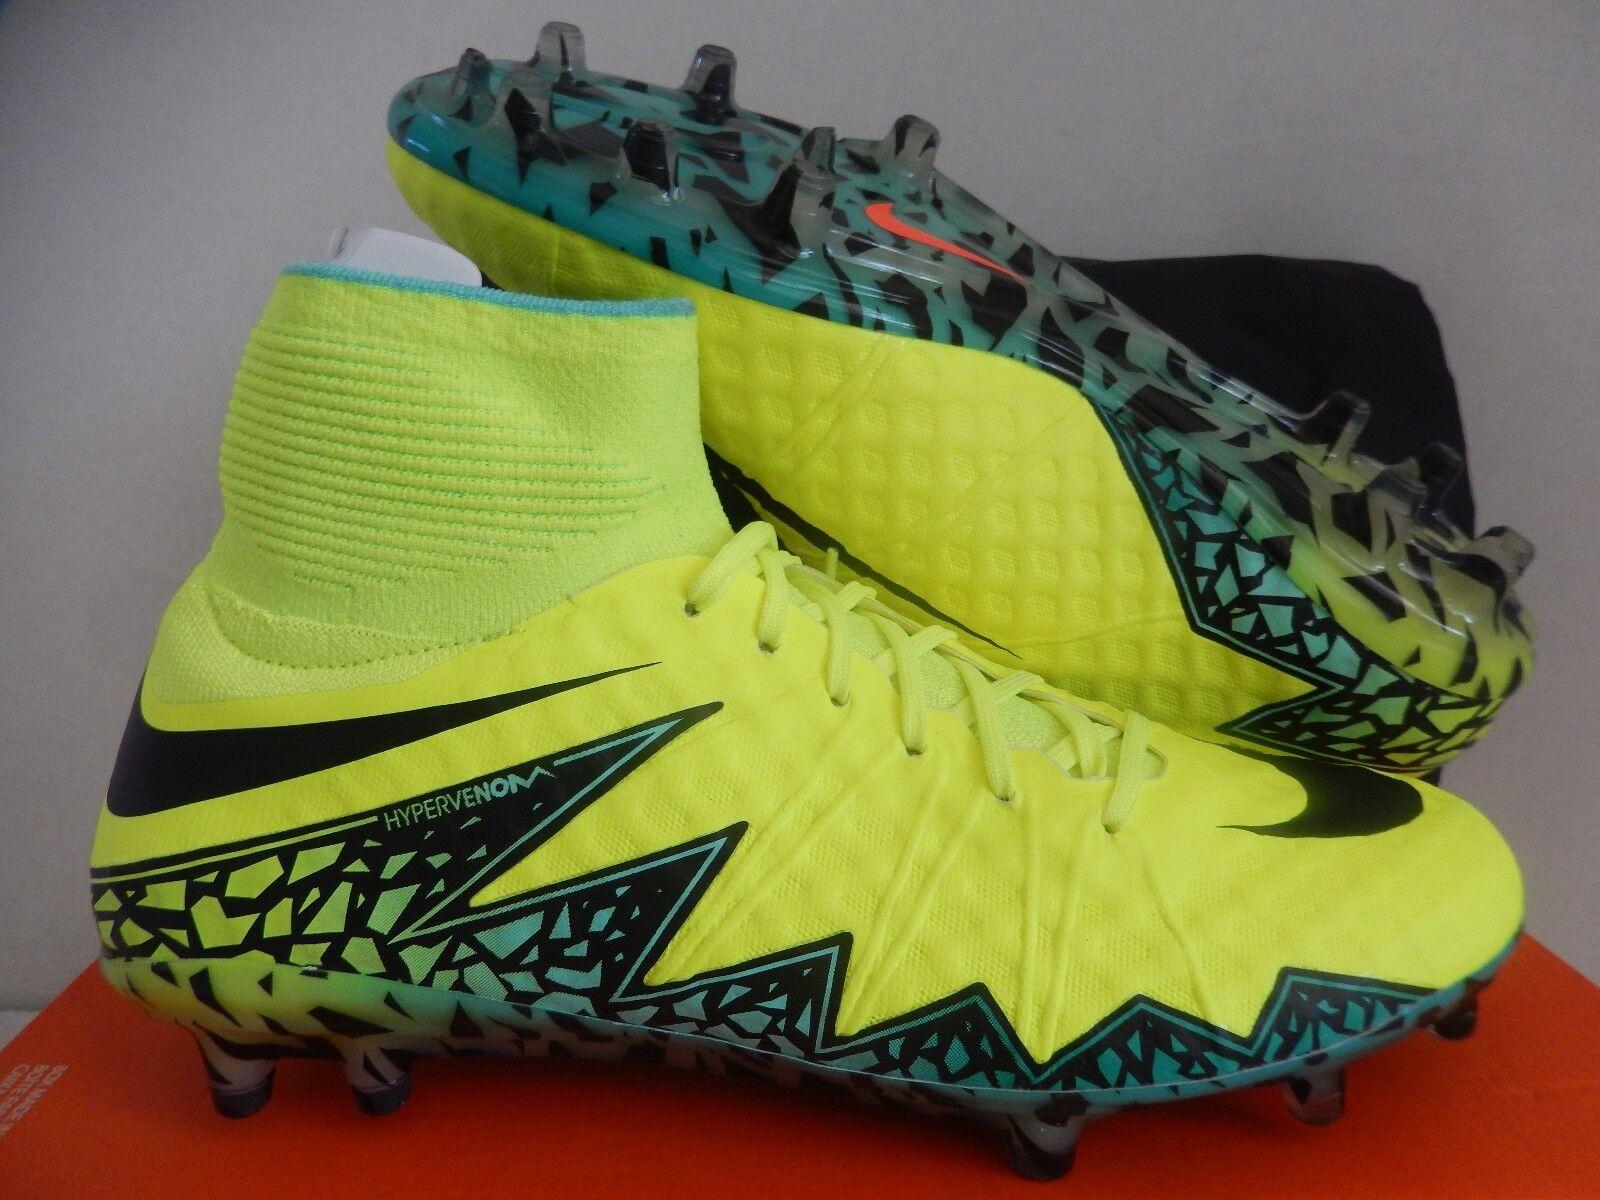 Nike Hypervenom Fantasma II Ojotas-Jade 2 Fg Volt-NEGRO-HYPER Ojotas-Jade II [747213-703] 8c781c